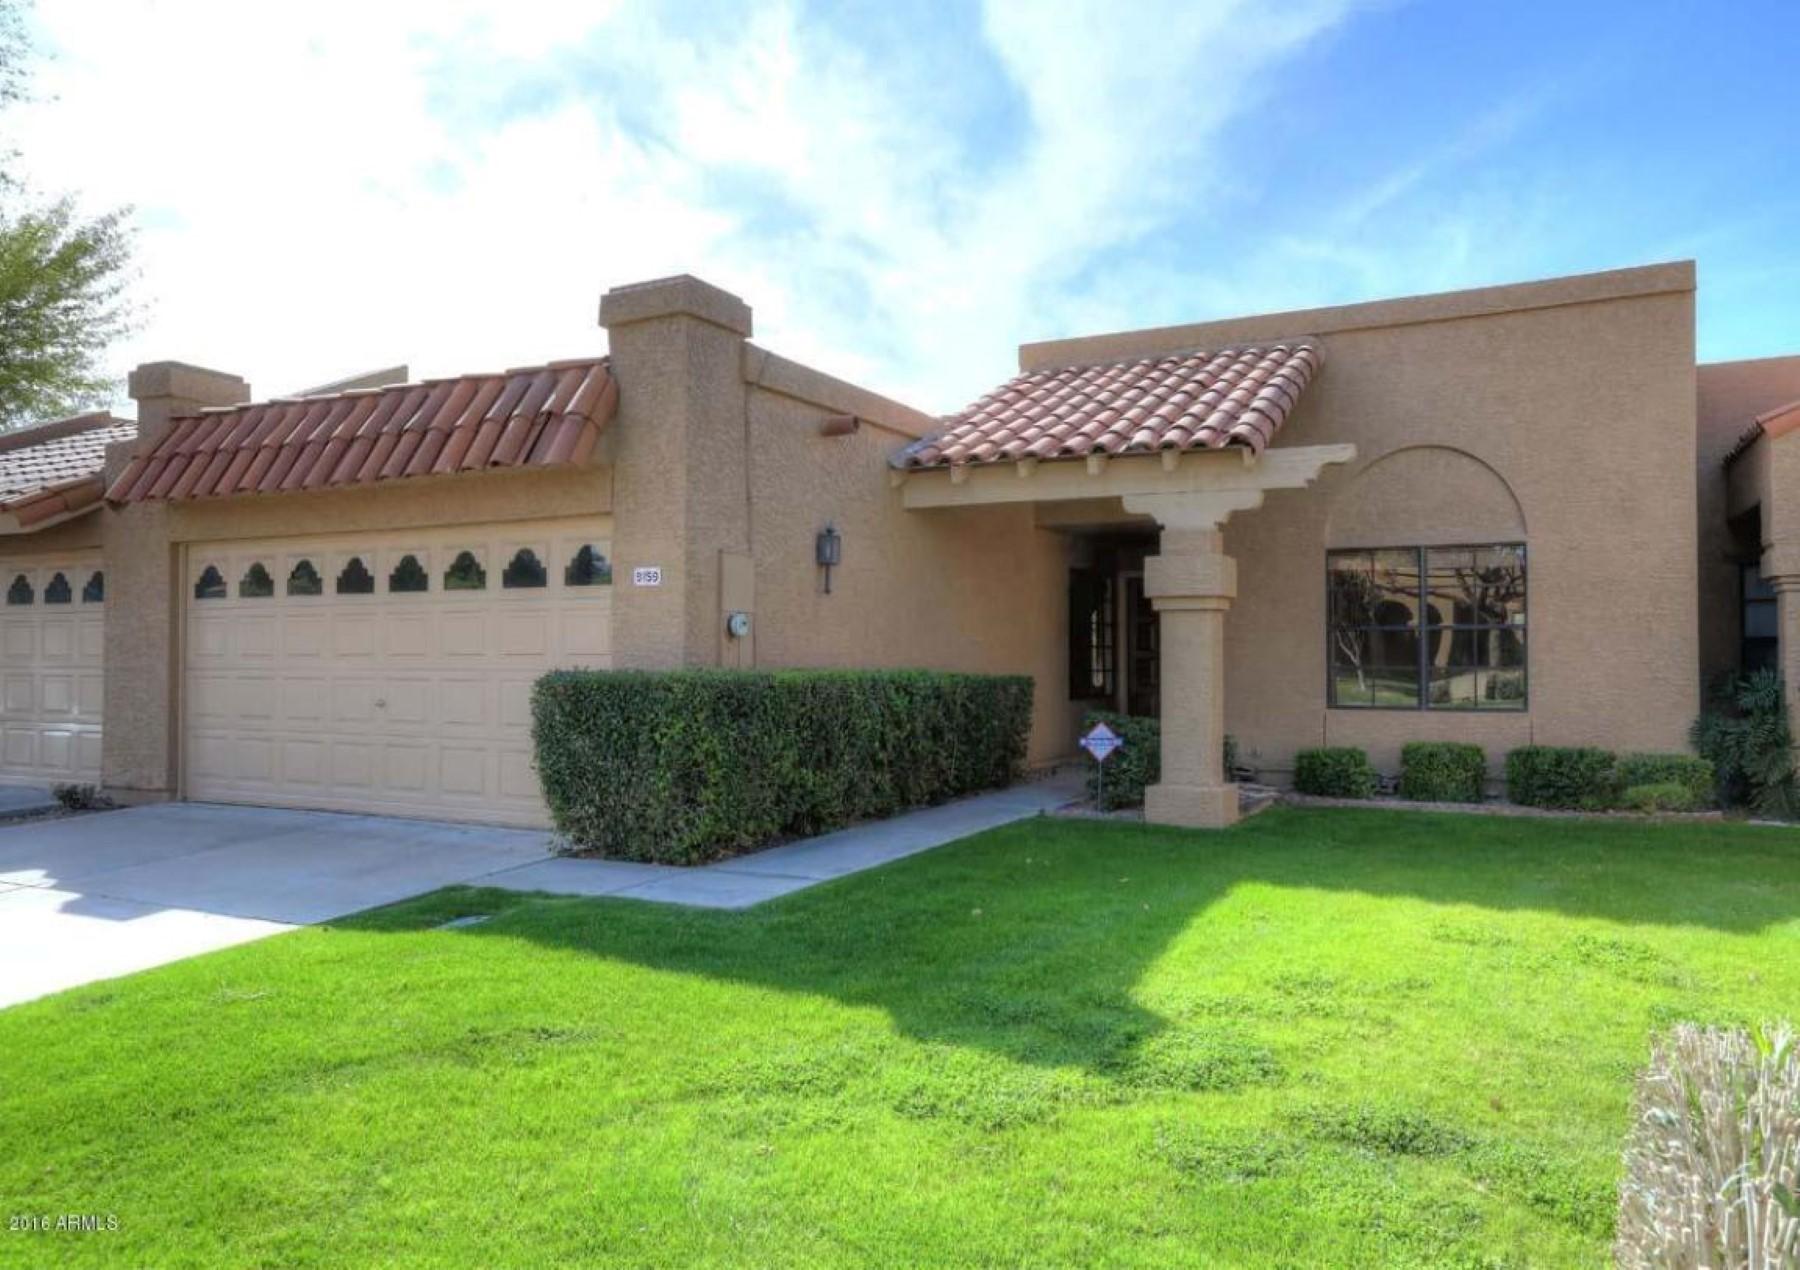 多棟聯建住宅 為 出售 在 Spacious single story townhouse 9159 E Winchcomb Dr E Scottsdale, 亞利桑那州, 85260 美國